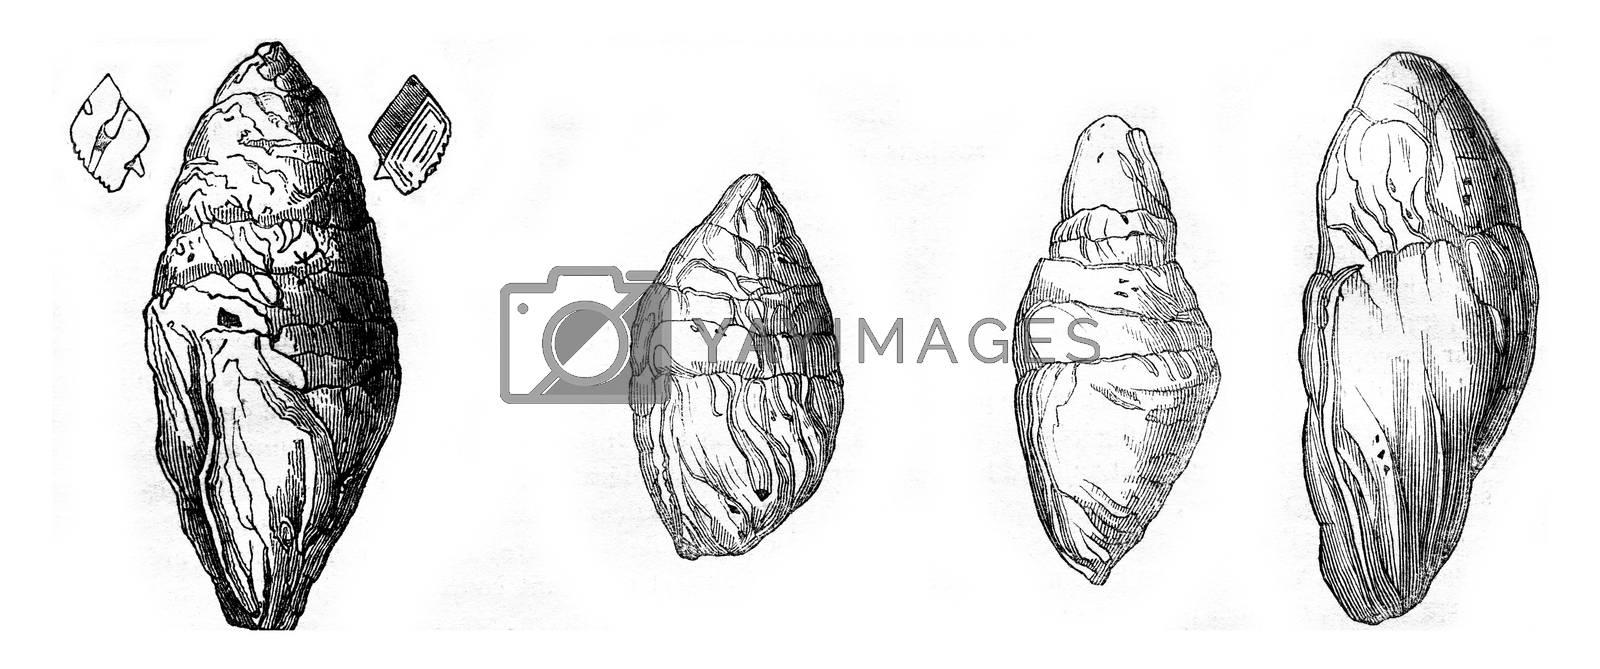 Coprolite the Lias at Lyme Regis, Other Coprolites Lyme, vintage engraved illustration. Magasin Pittoresque 1844.